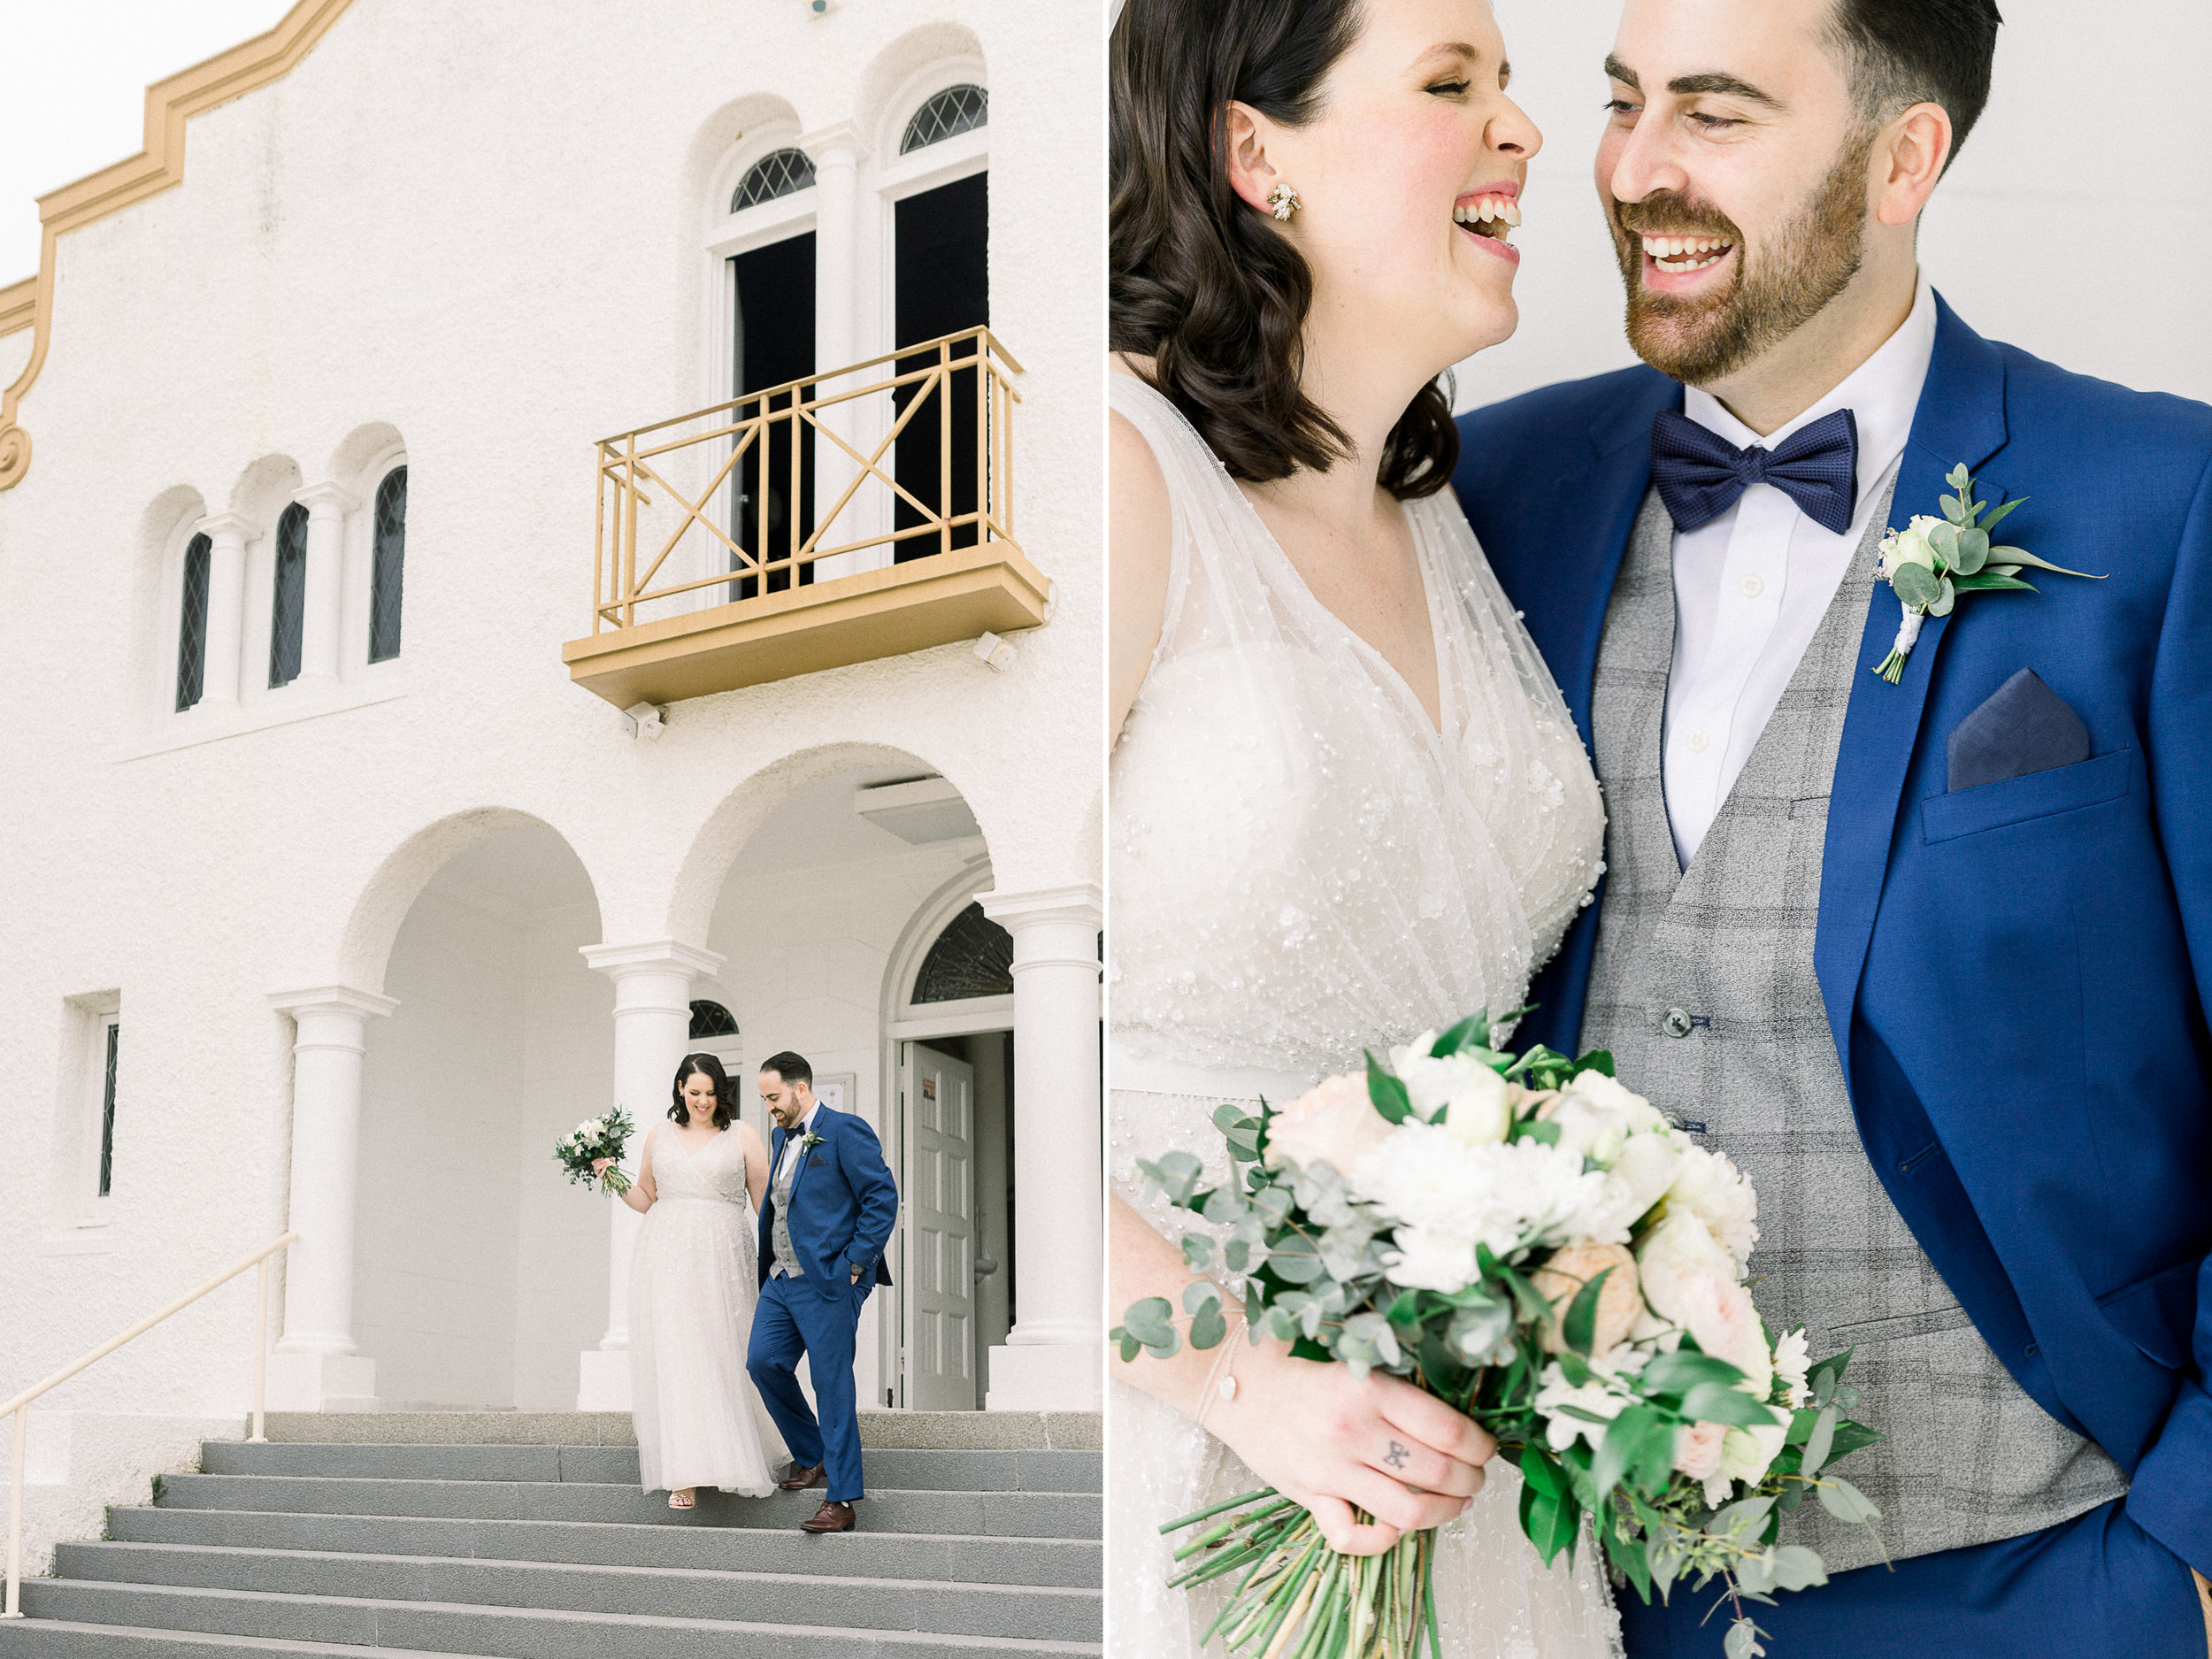 brisbane-city-wedding-romantic-bridal-photos-4.jpg